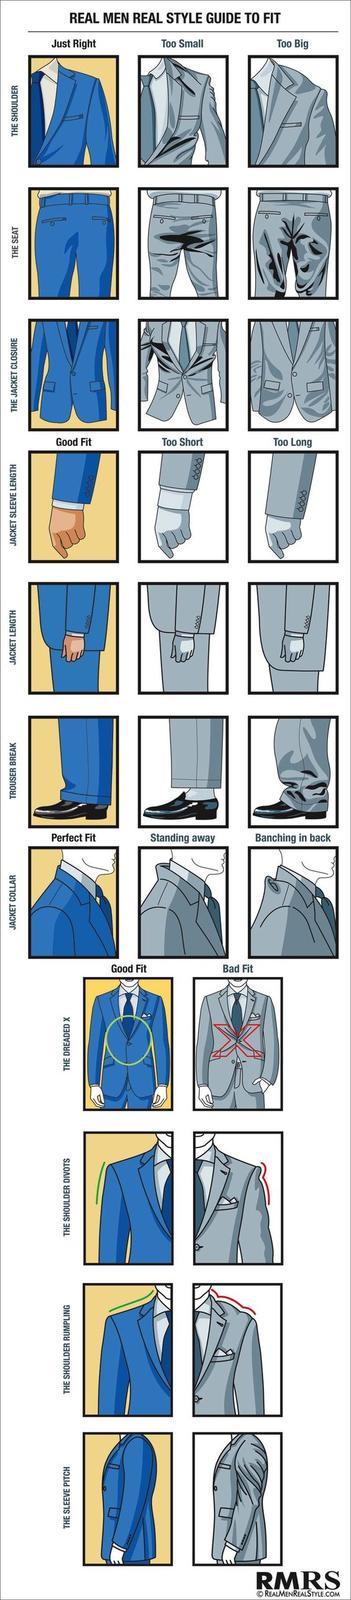 Suit - Obrázok č. 4